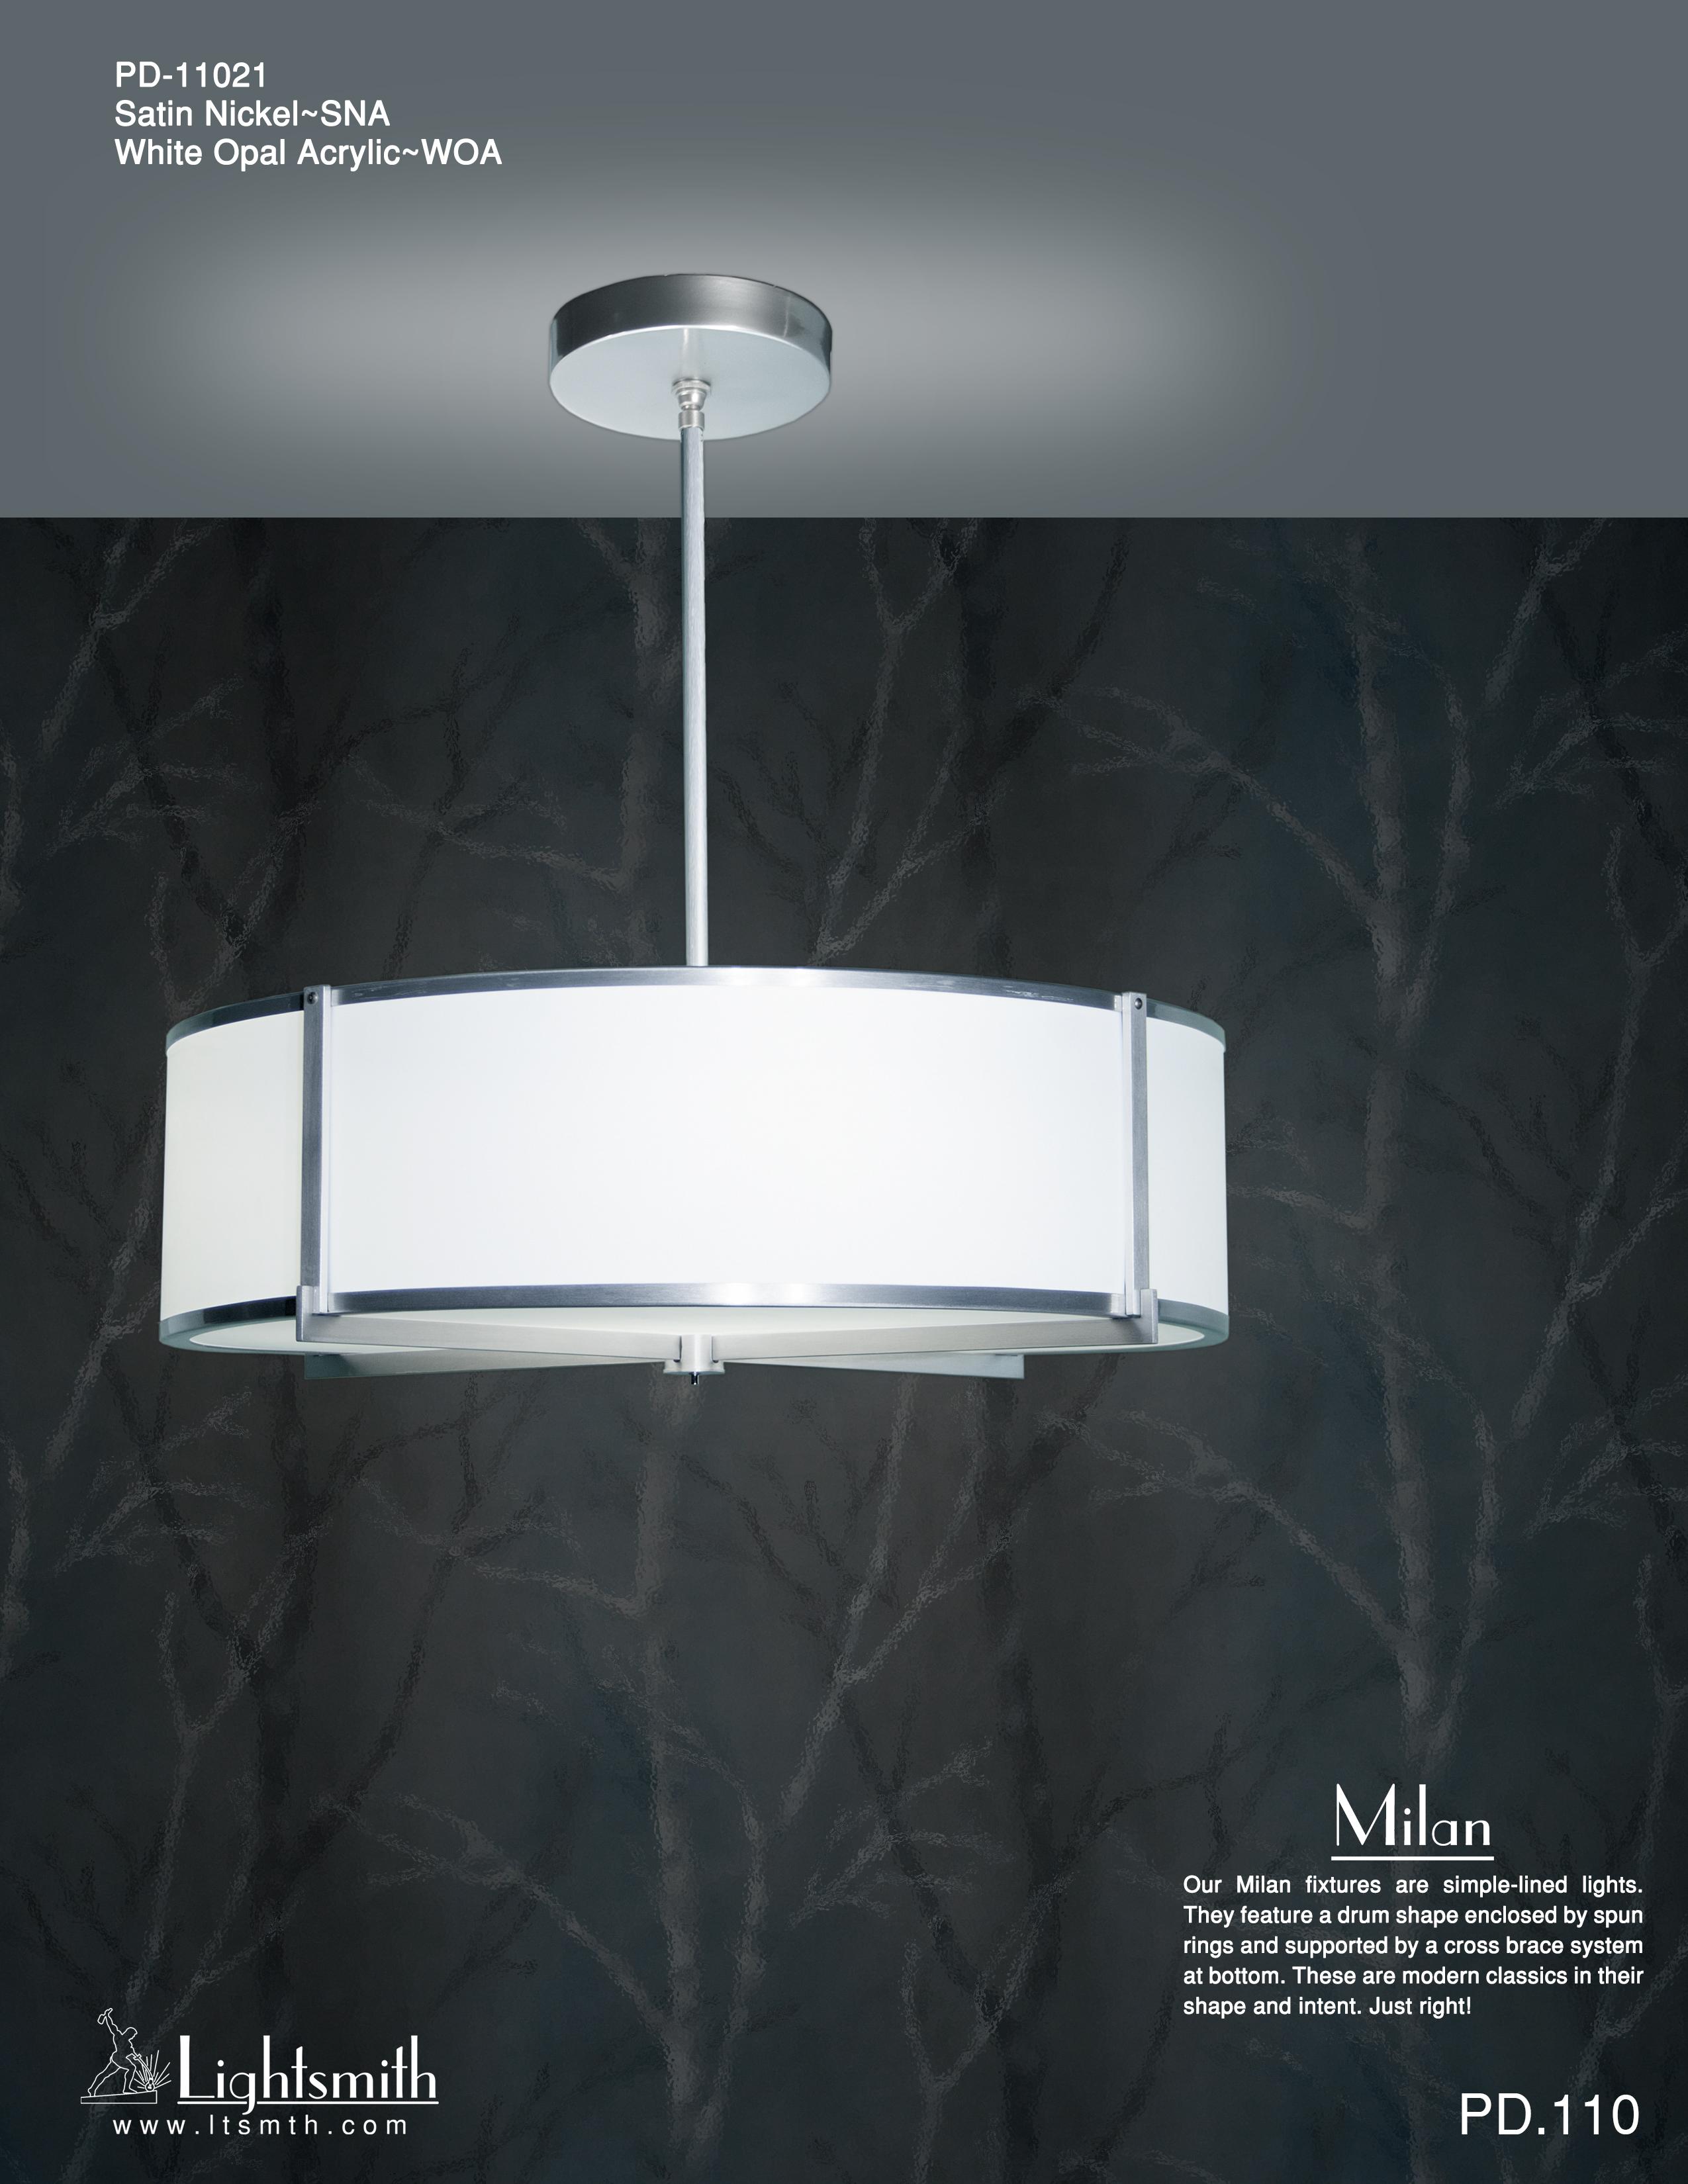 Milan Lightsmith Pd Simple 11021 Satin Nickel White Opal Acrylic